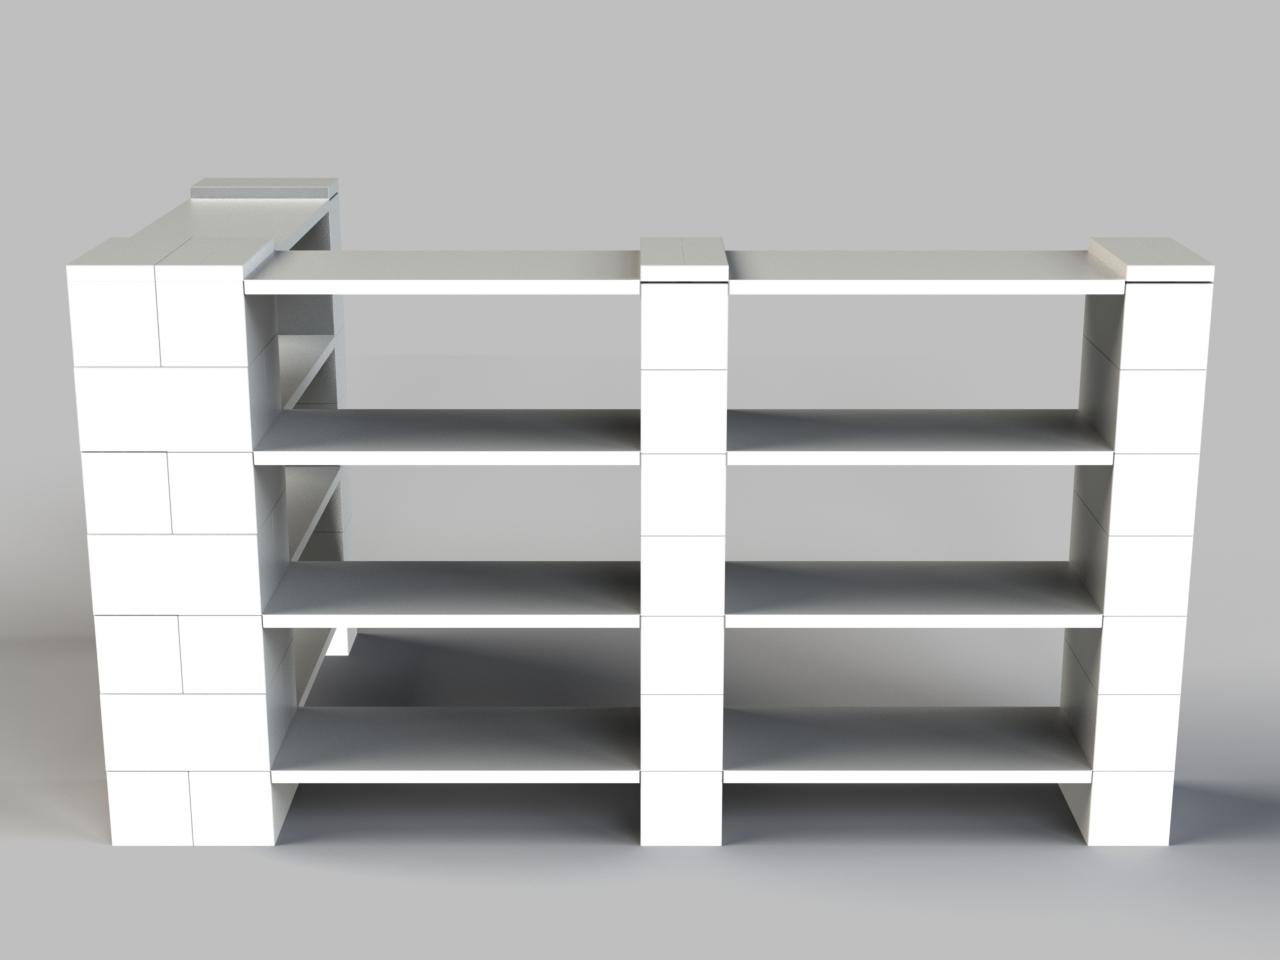 4 Level Double Corner Shelving Kit B Everblock Systems